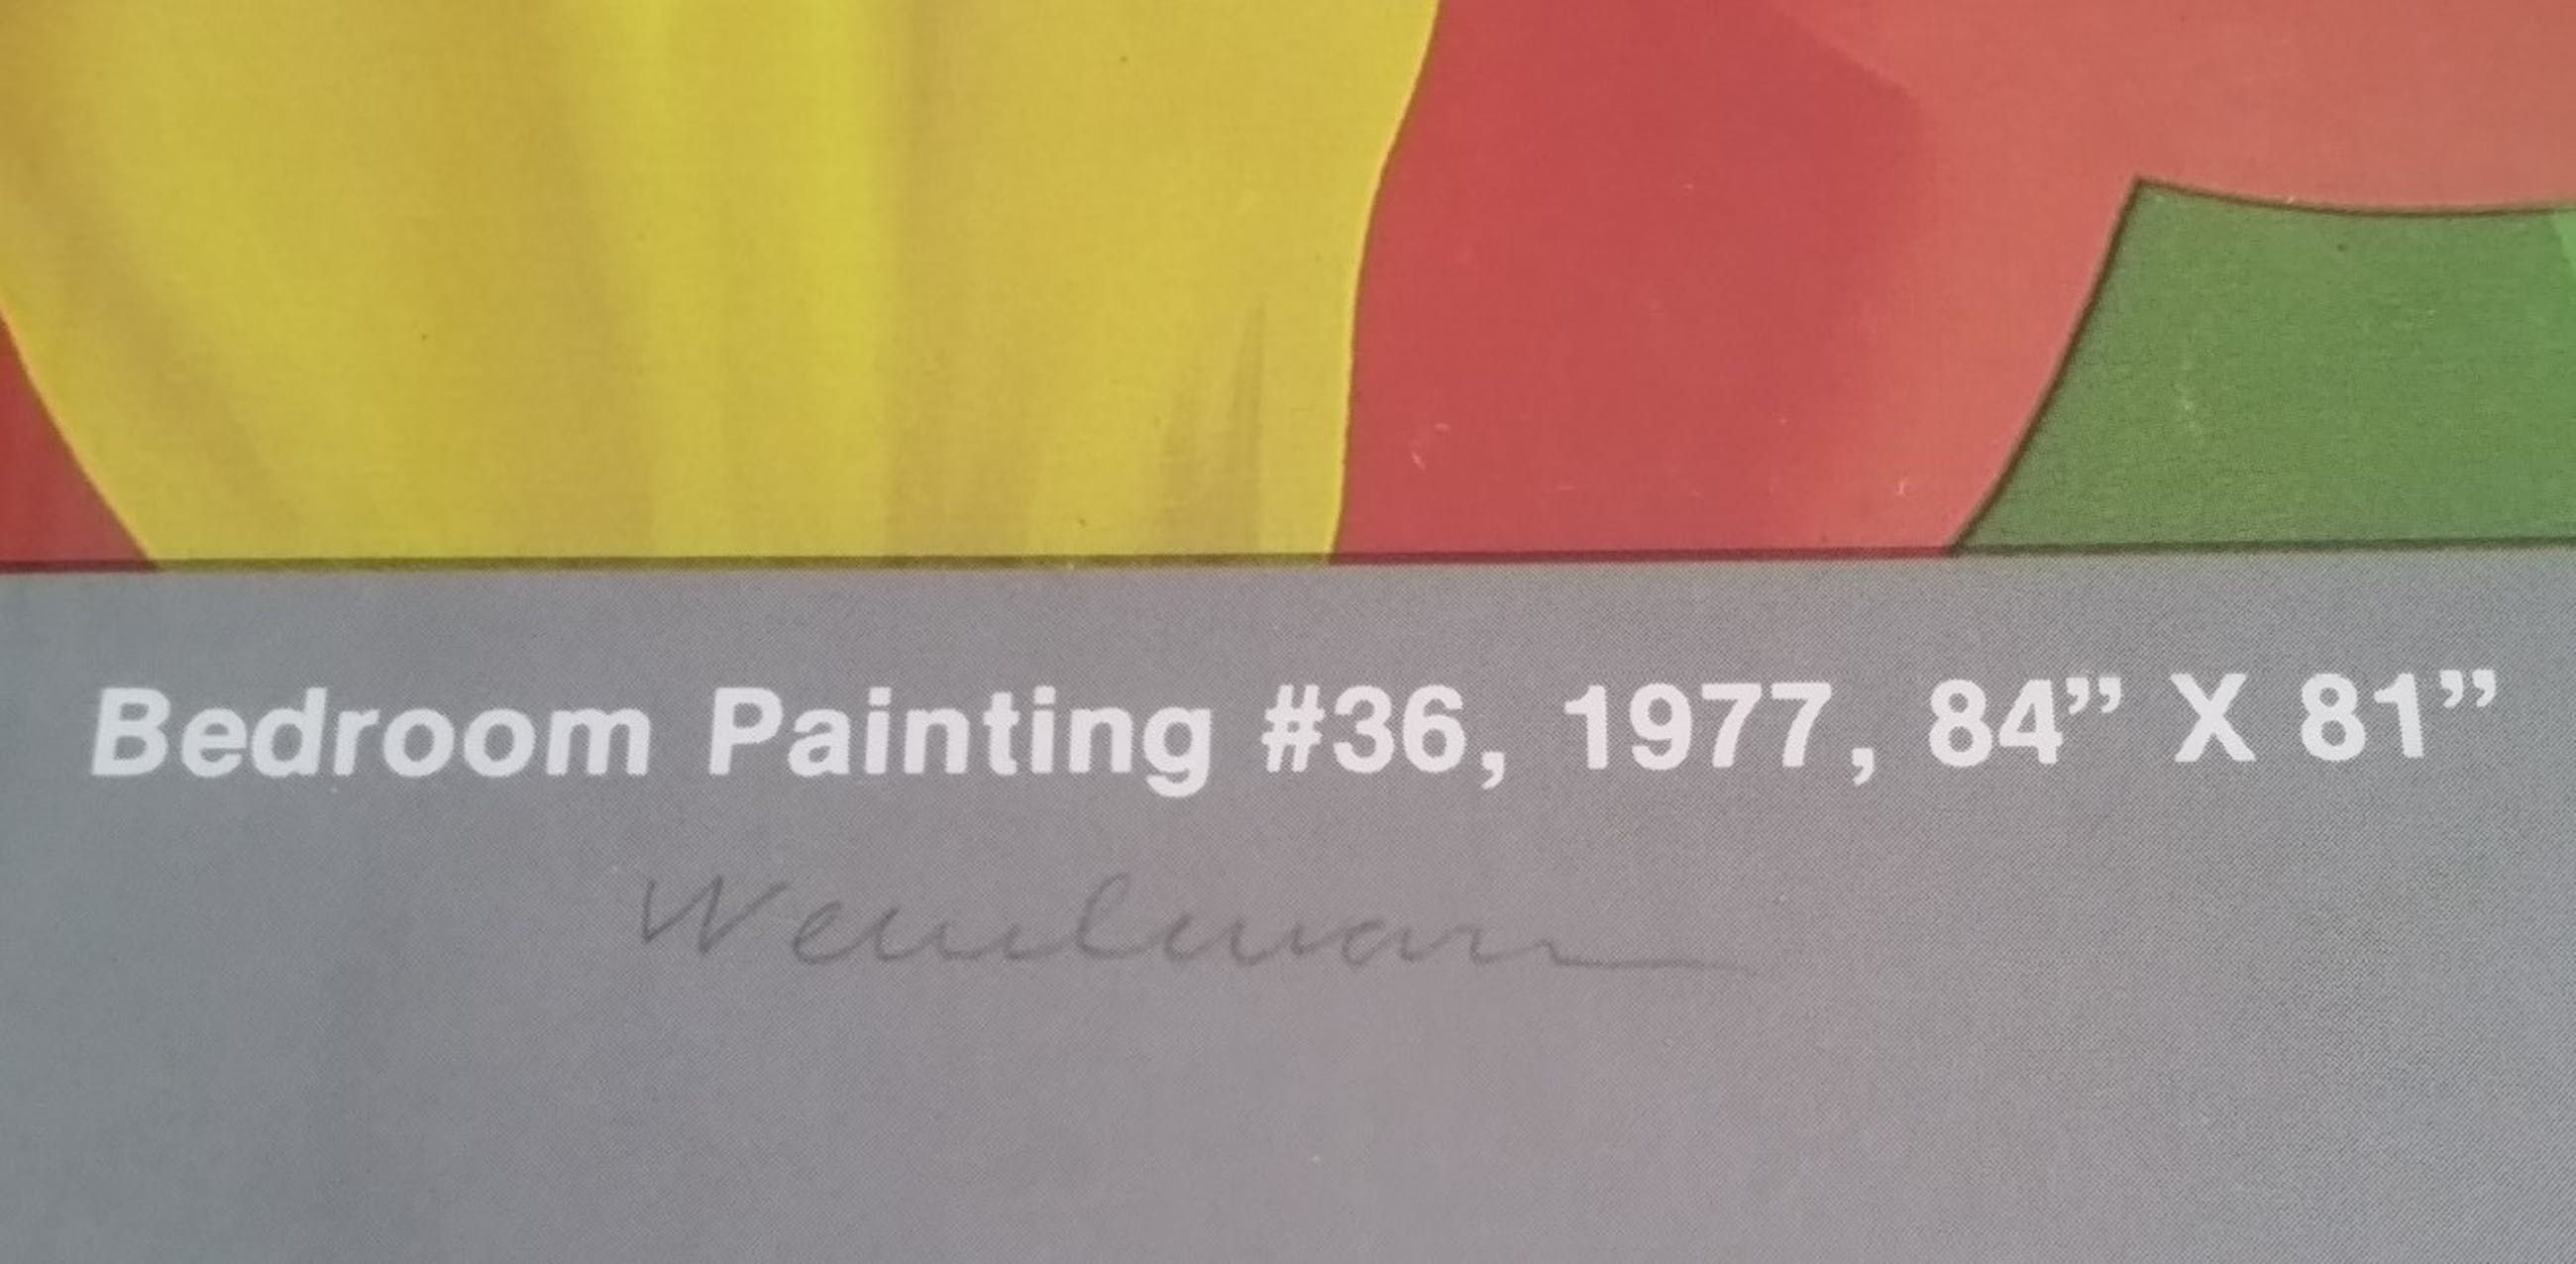 Tom Wesselmann - Gesigneerde Exhibition Poster - Bedroom Painting #36 kopen? Bied vanaf 75!